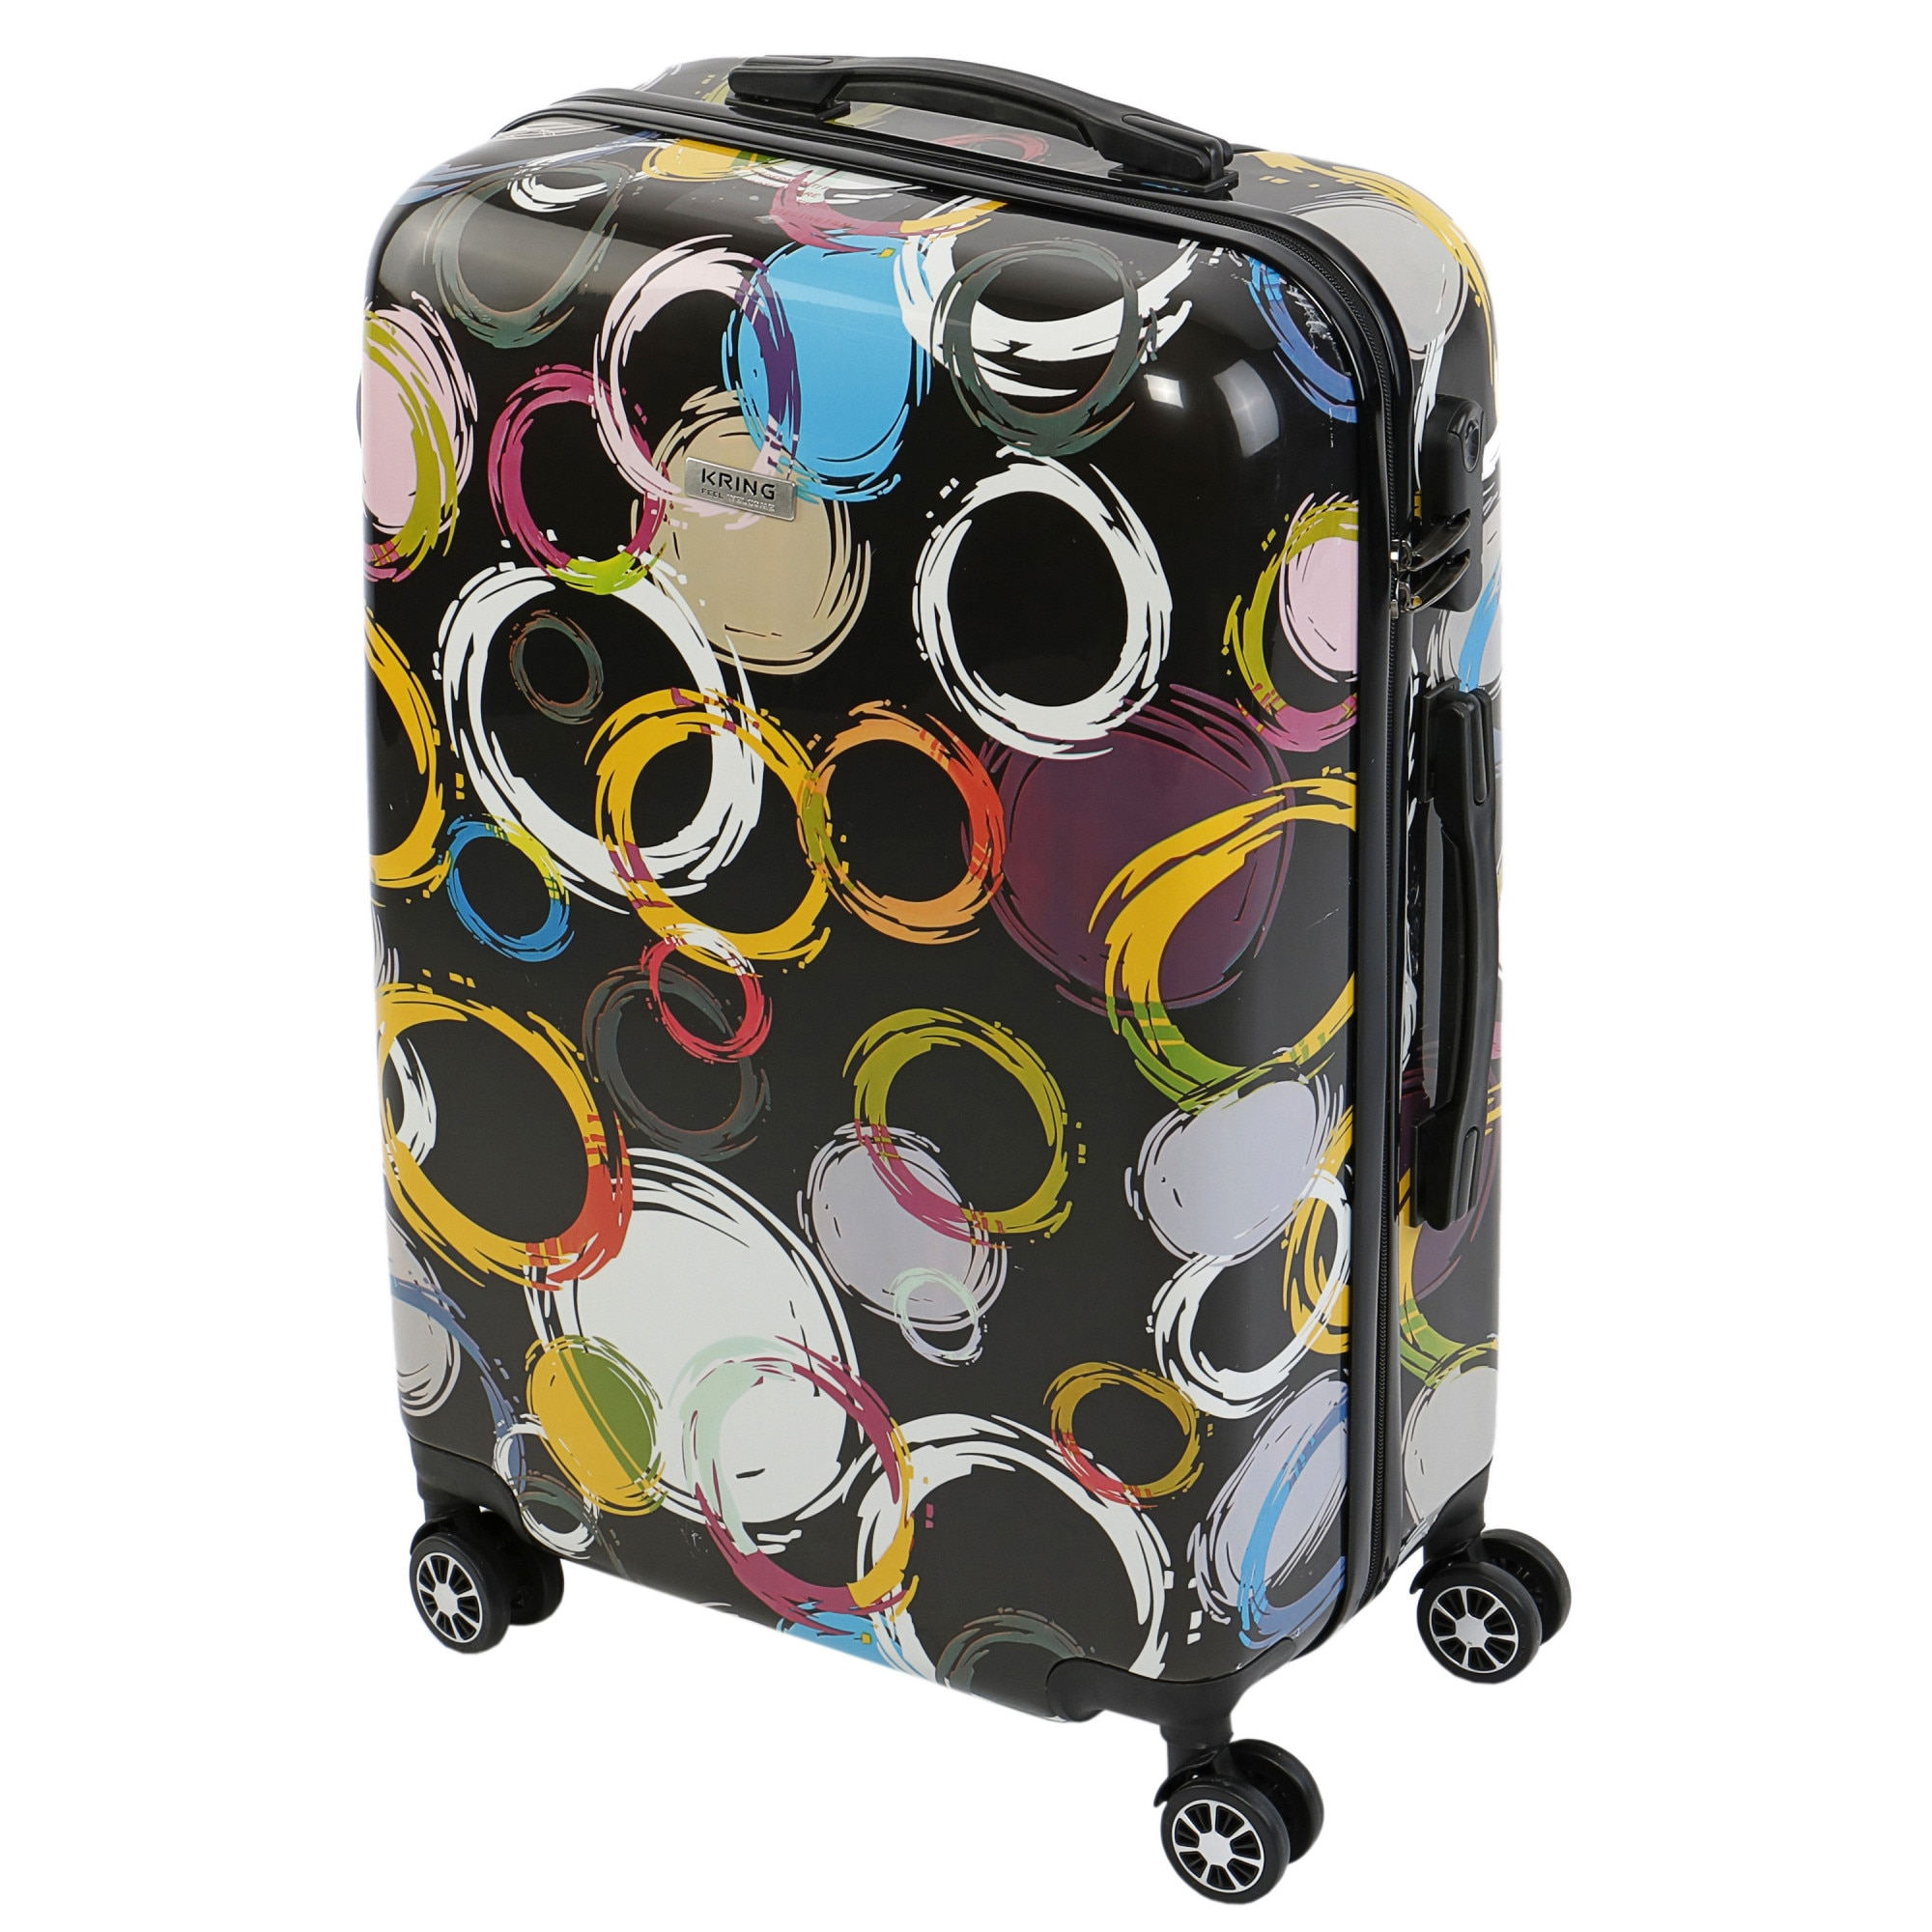 Fotografie Troler KRING Circles, ABS+PC, 65 cm, Multicolor